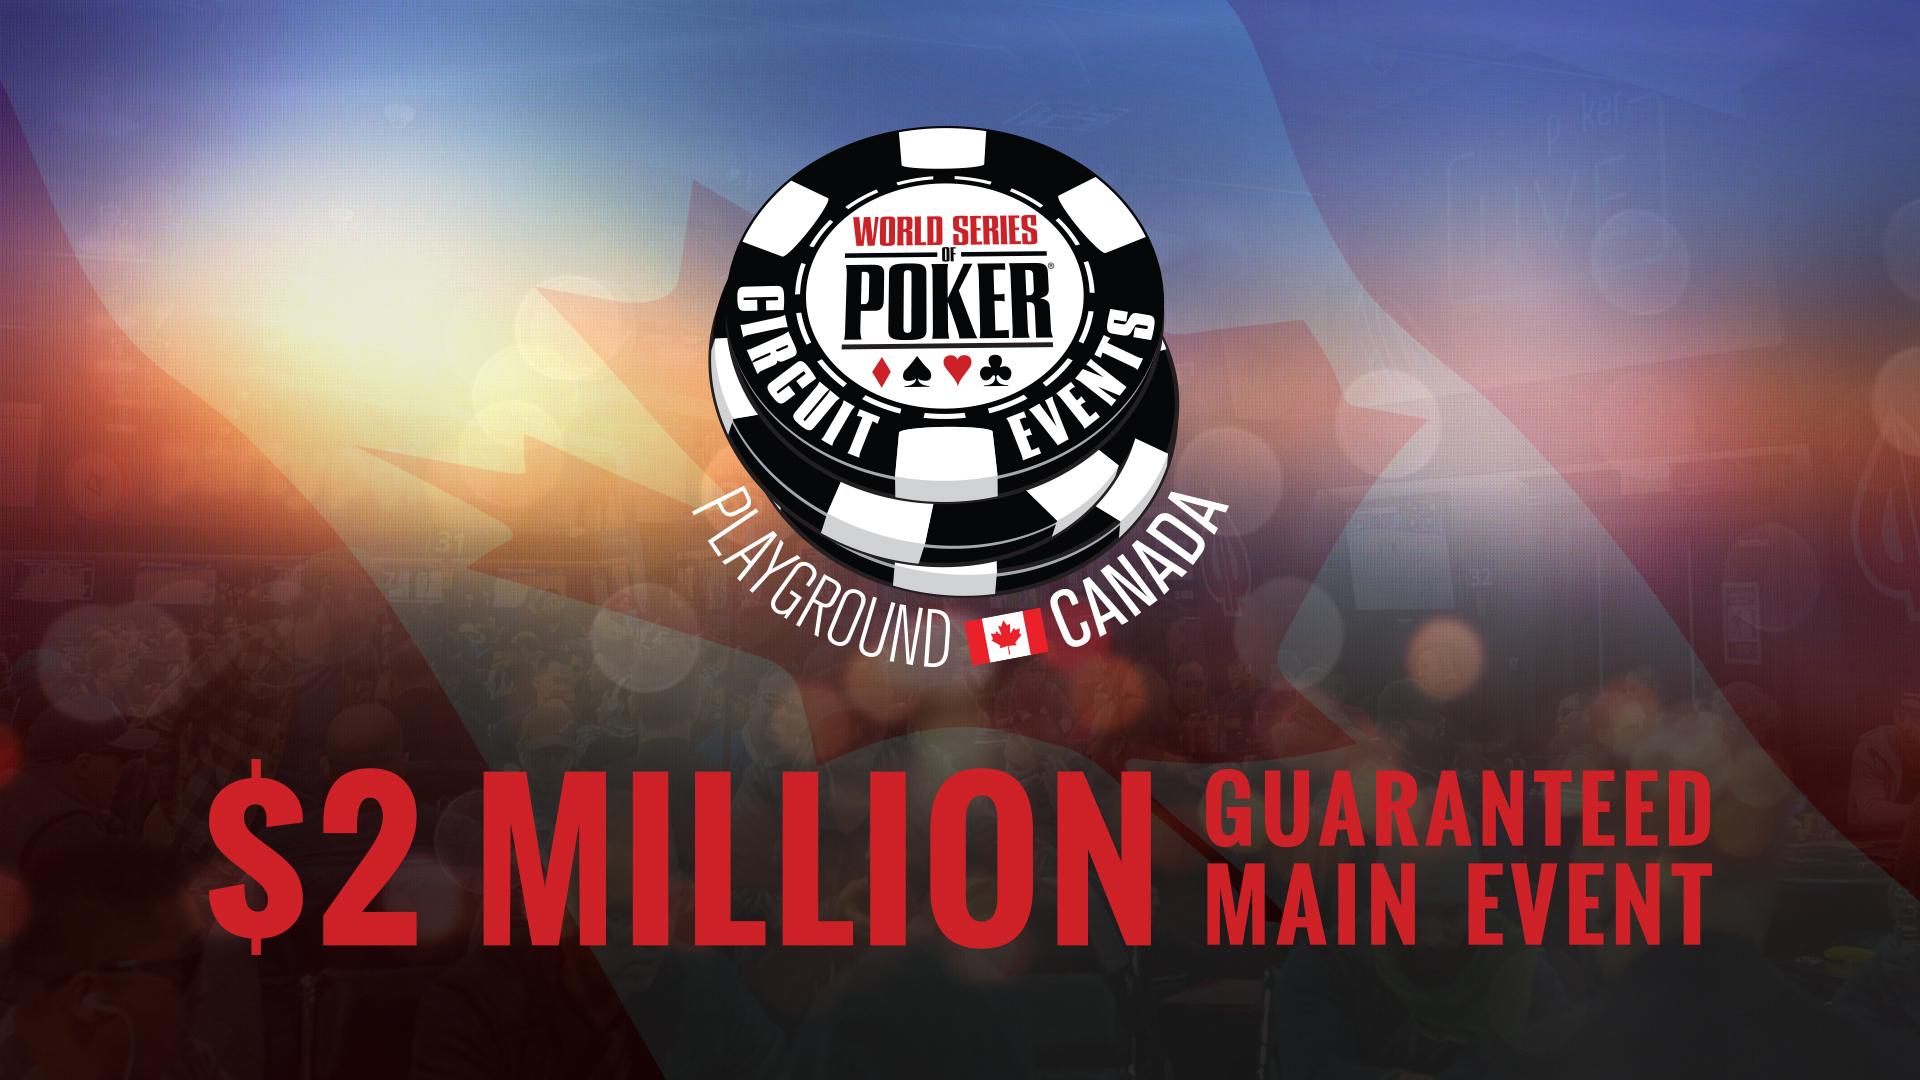 The World Series of Poker International Circuit returns